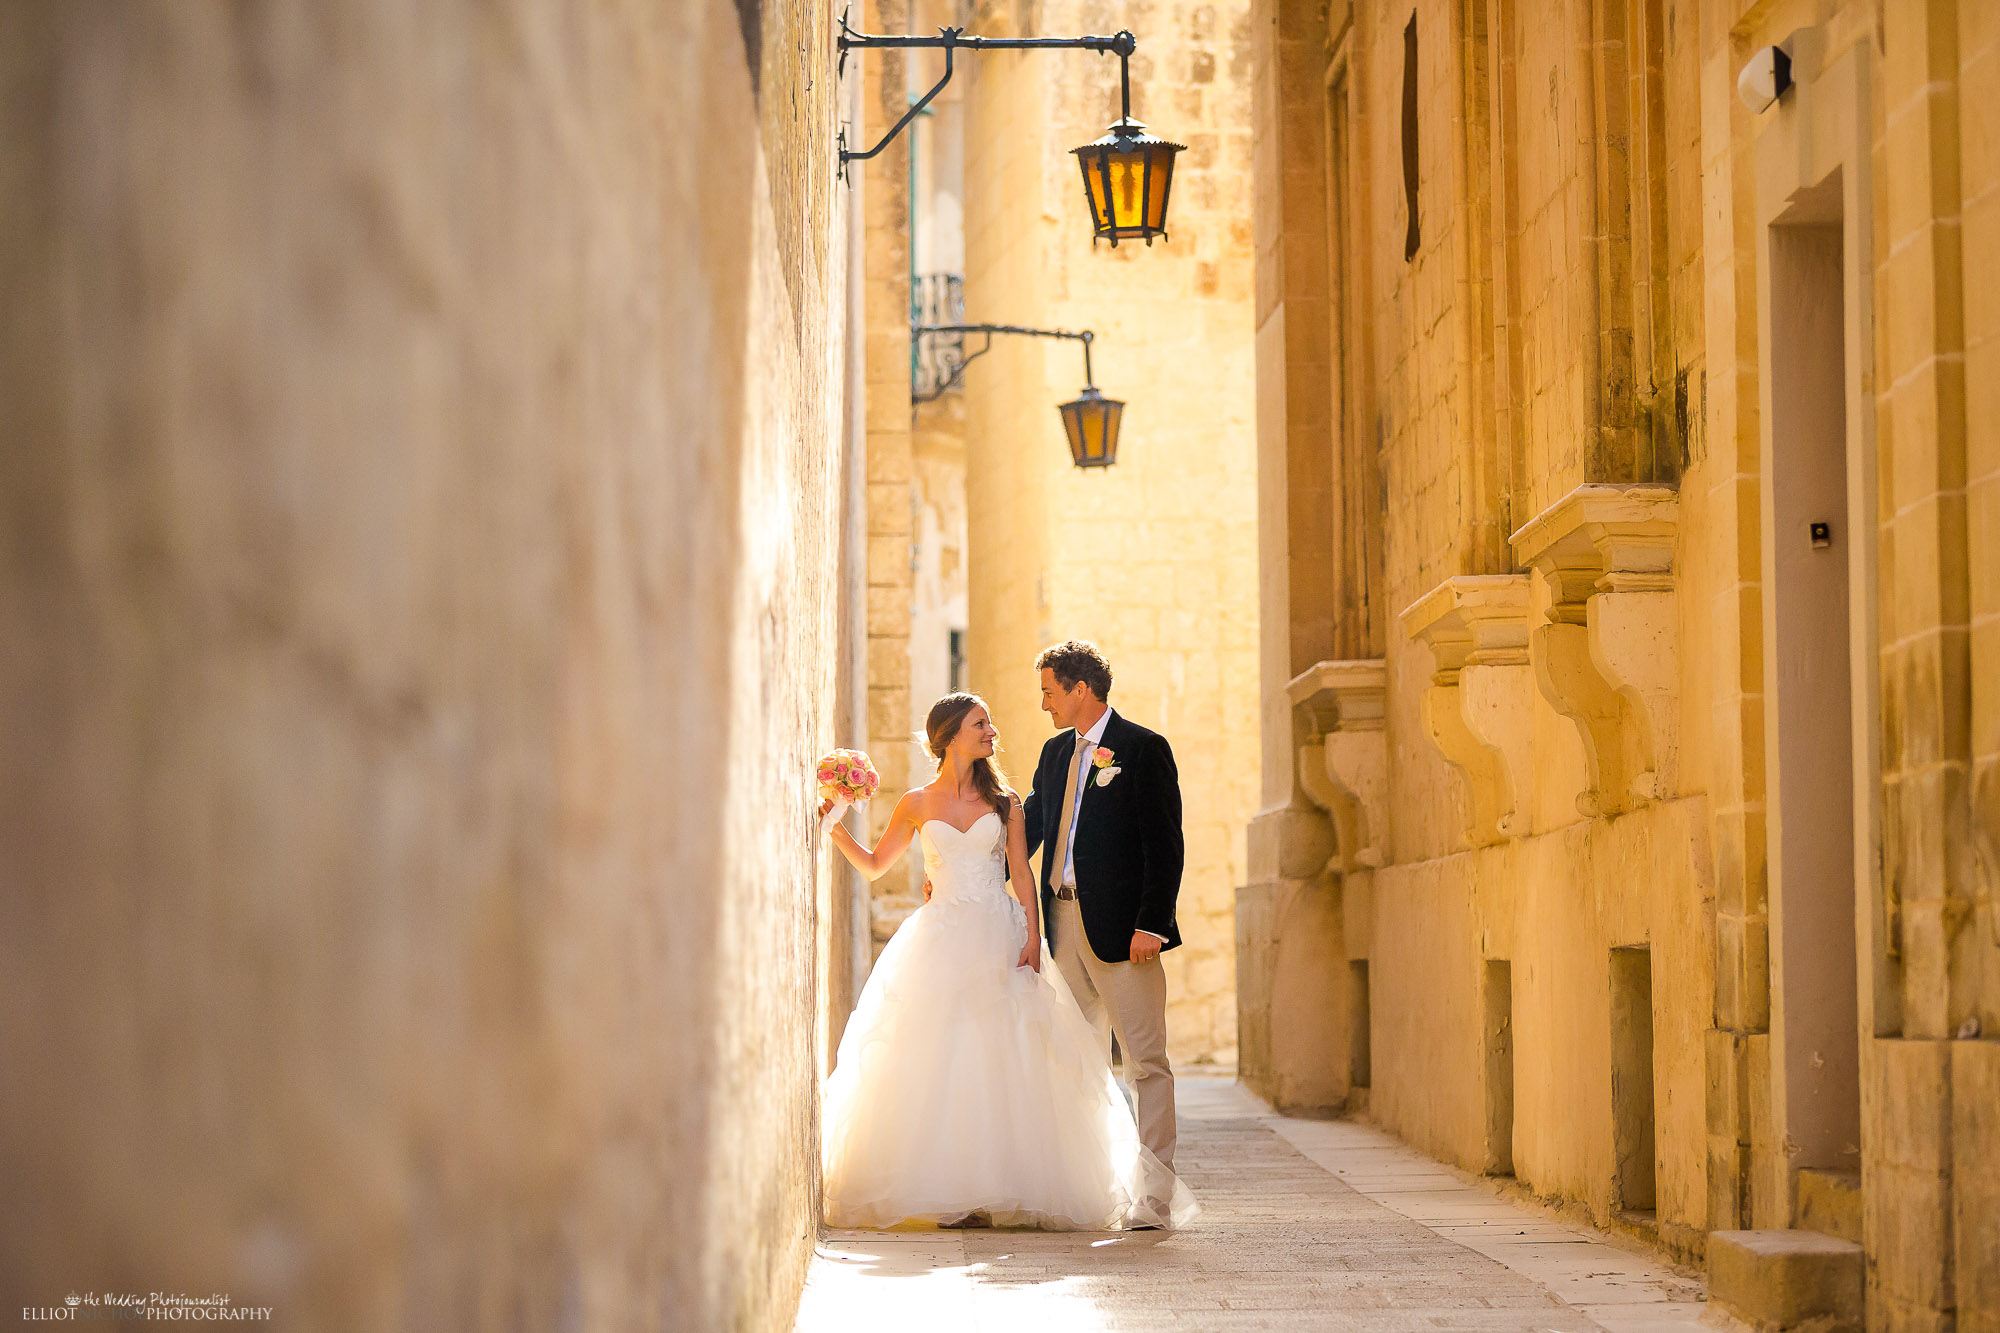 bride-groom-newlyweds-portrait-photographer-Newcastle-wedding-photographer